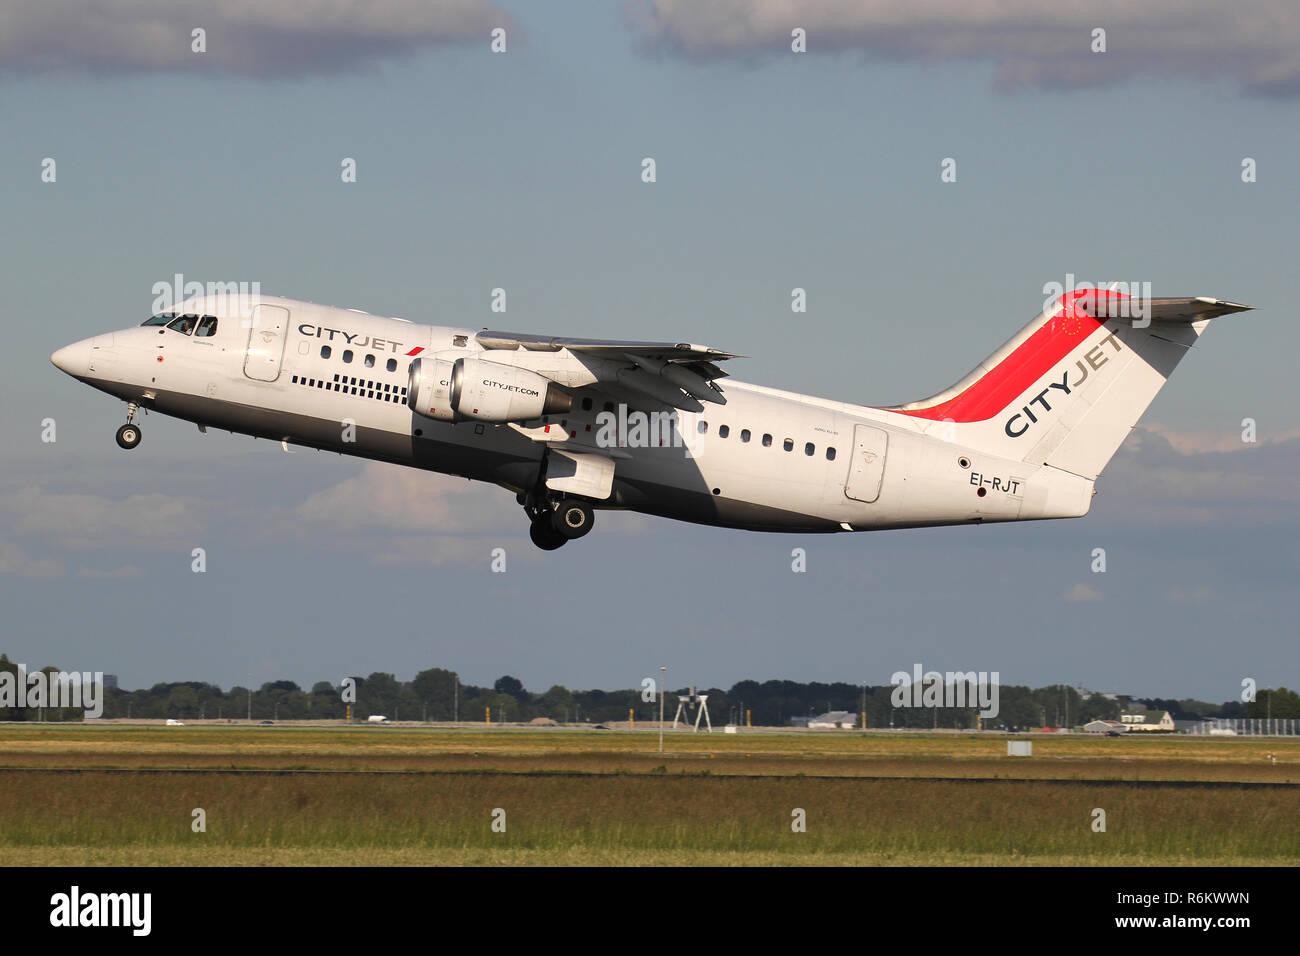 Irish CityJet Avro RJ85 with registration EI-RJT just airborne at Amsterdam Airport Schiphol. - Stock Image